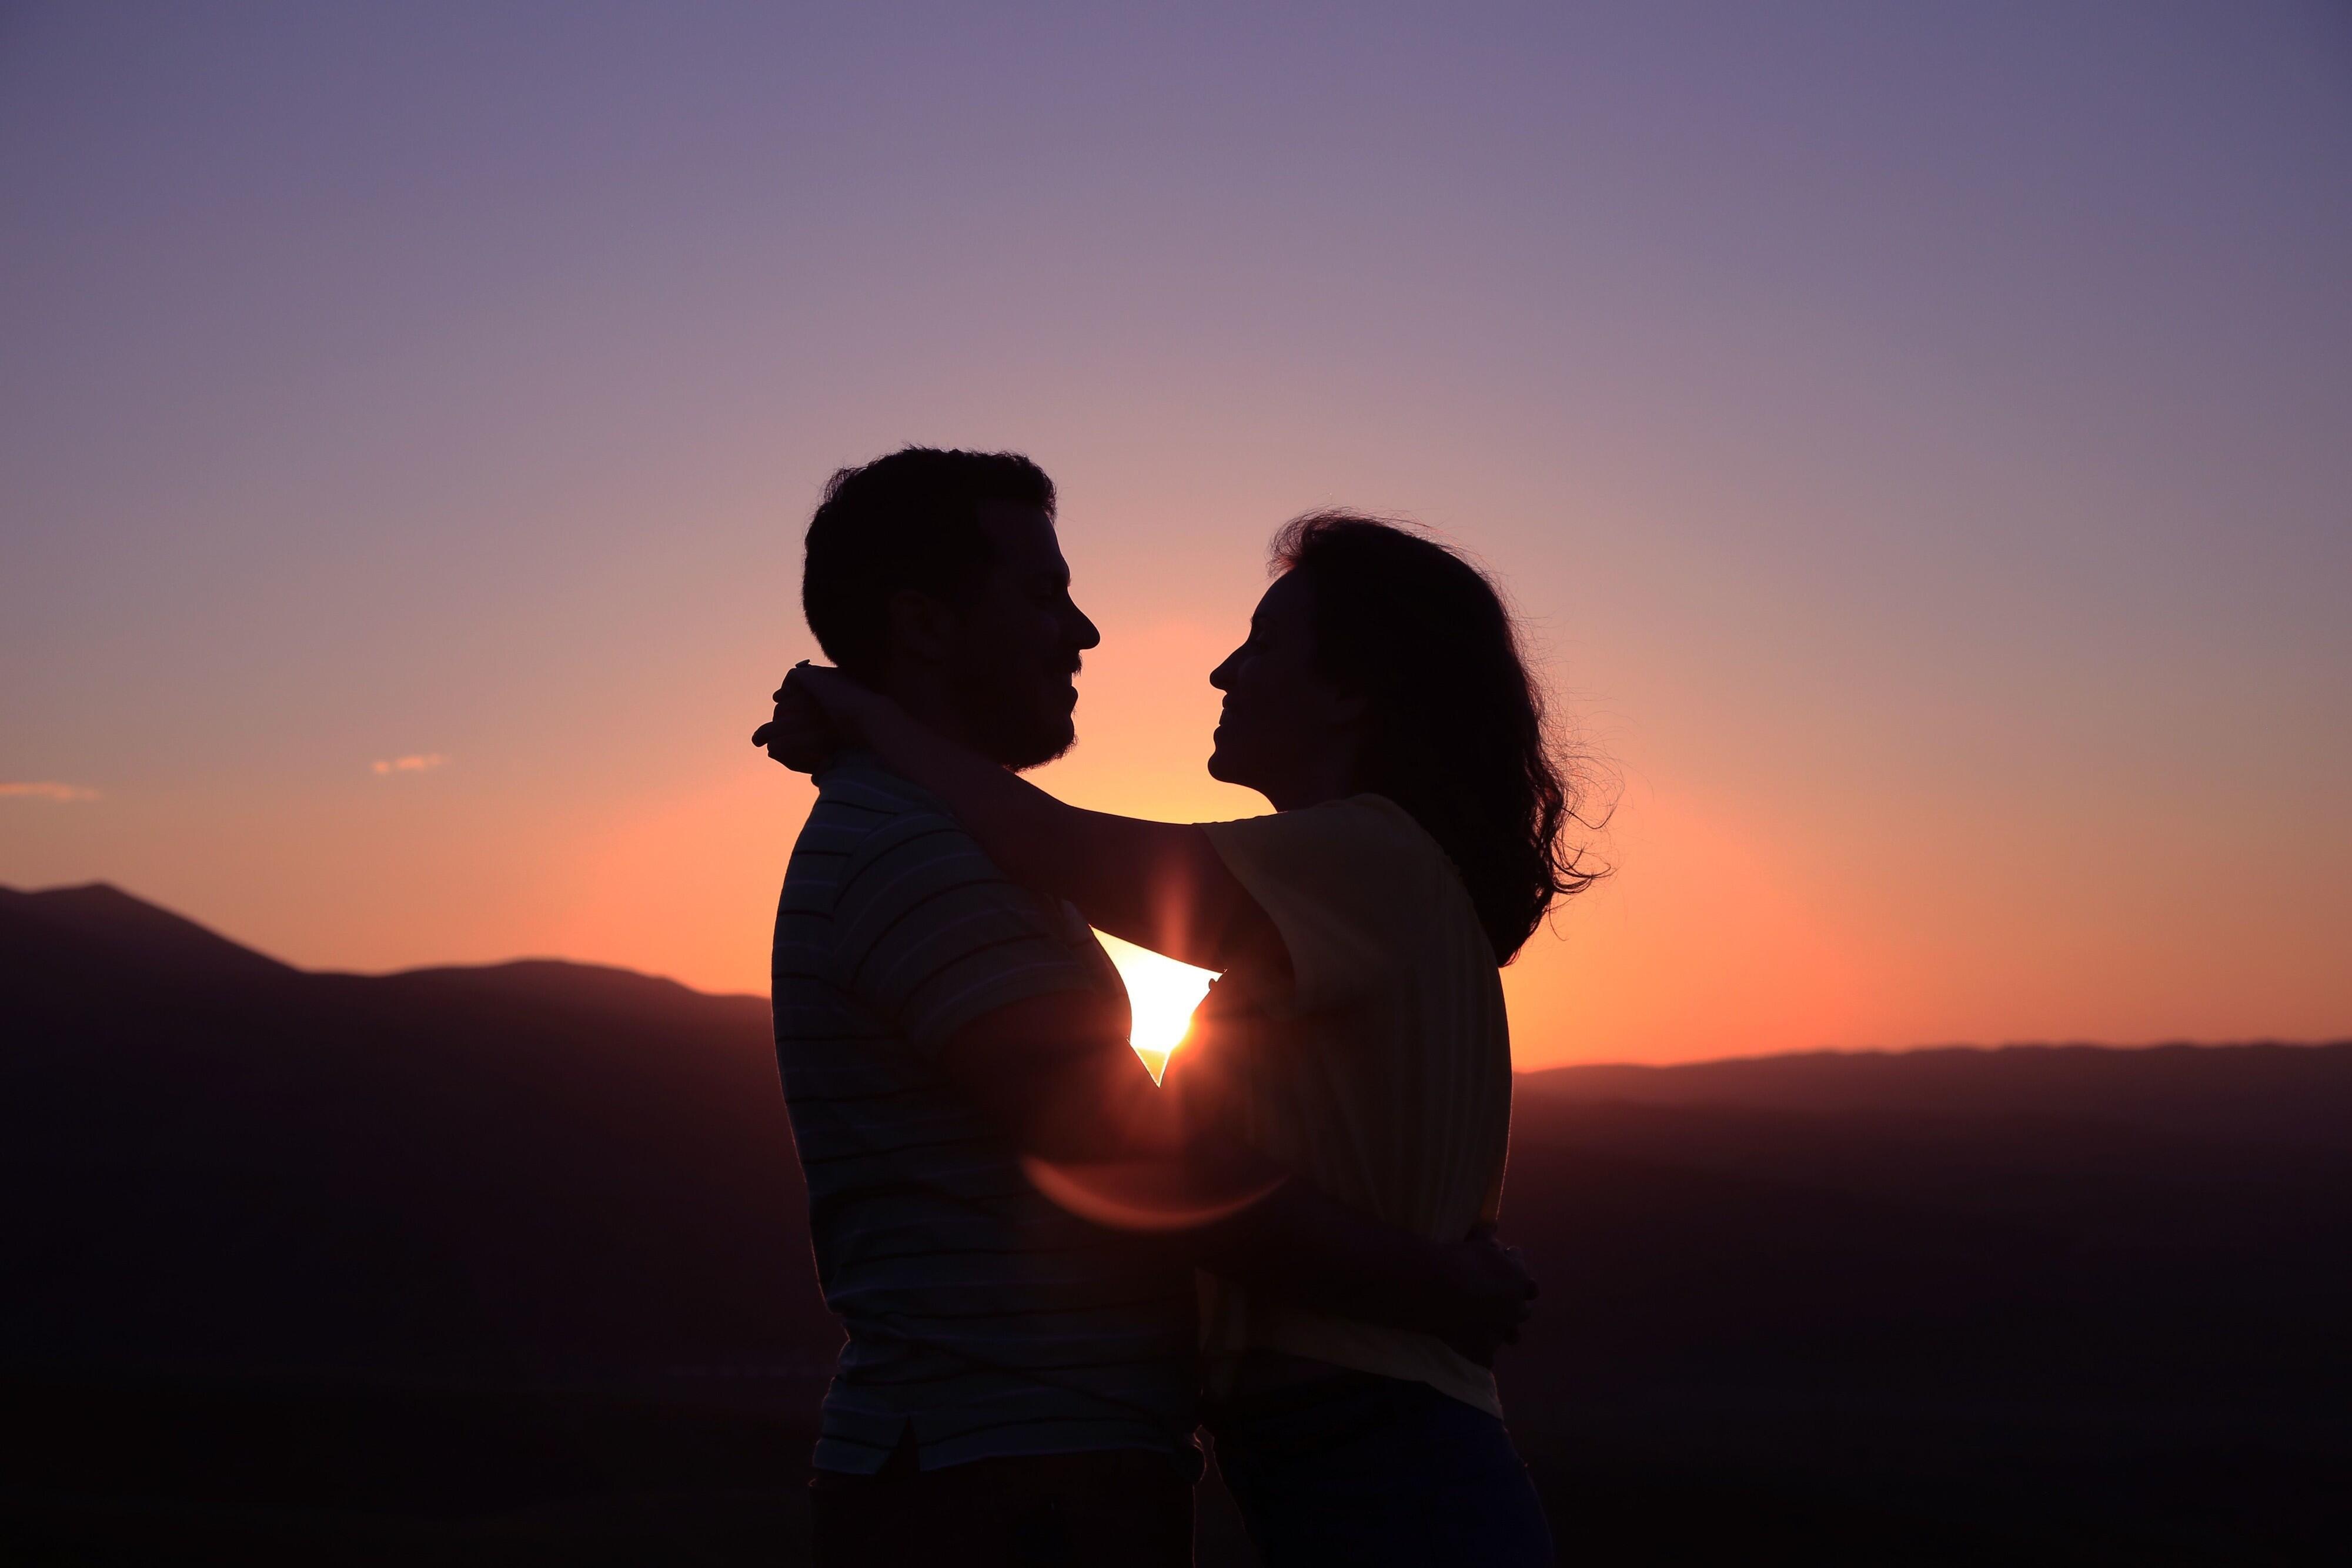 Agar Tidak Kecewa, Hilangkan 7 Ekspektasi Ini dari Pasanganmu